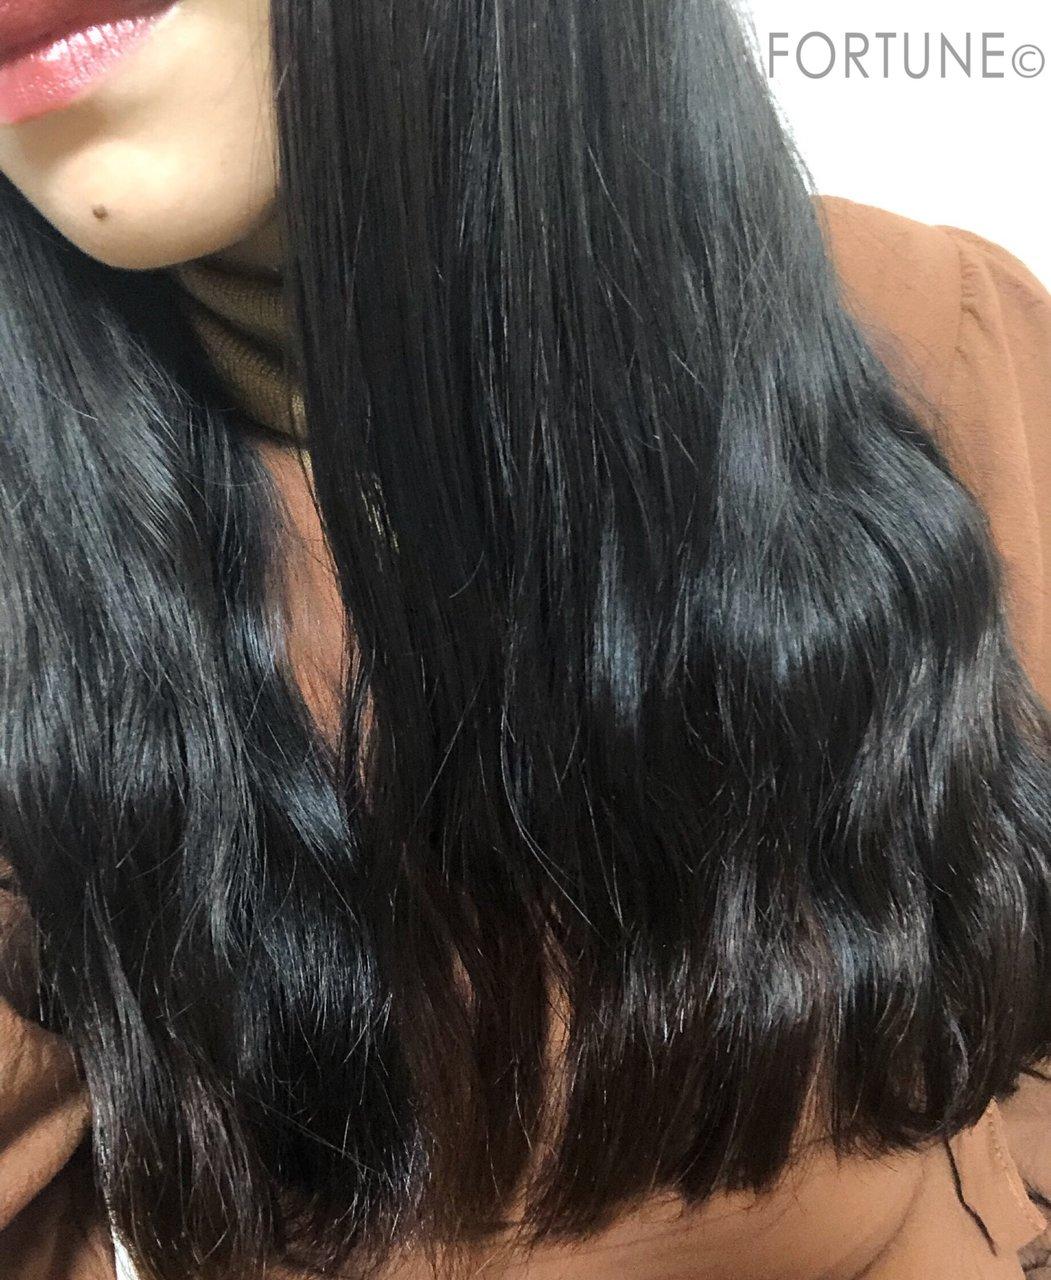 Saborino(サボリーノ ) 髪と地肌を手早くクレンズ トリートメントシャンプー リッチモイスト 使用感